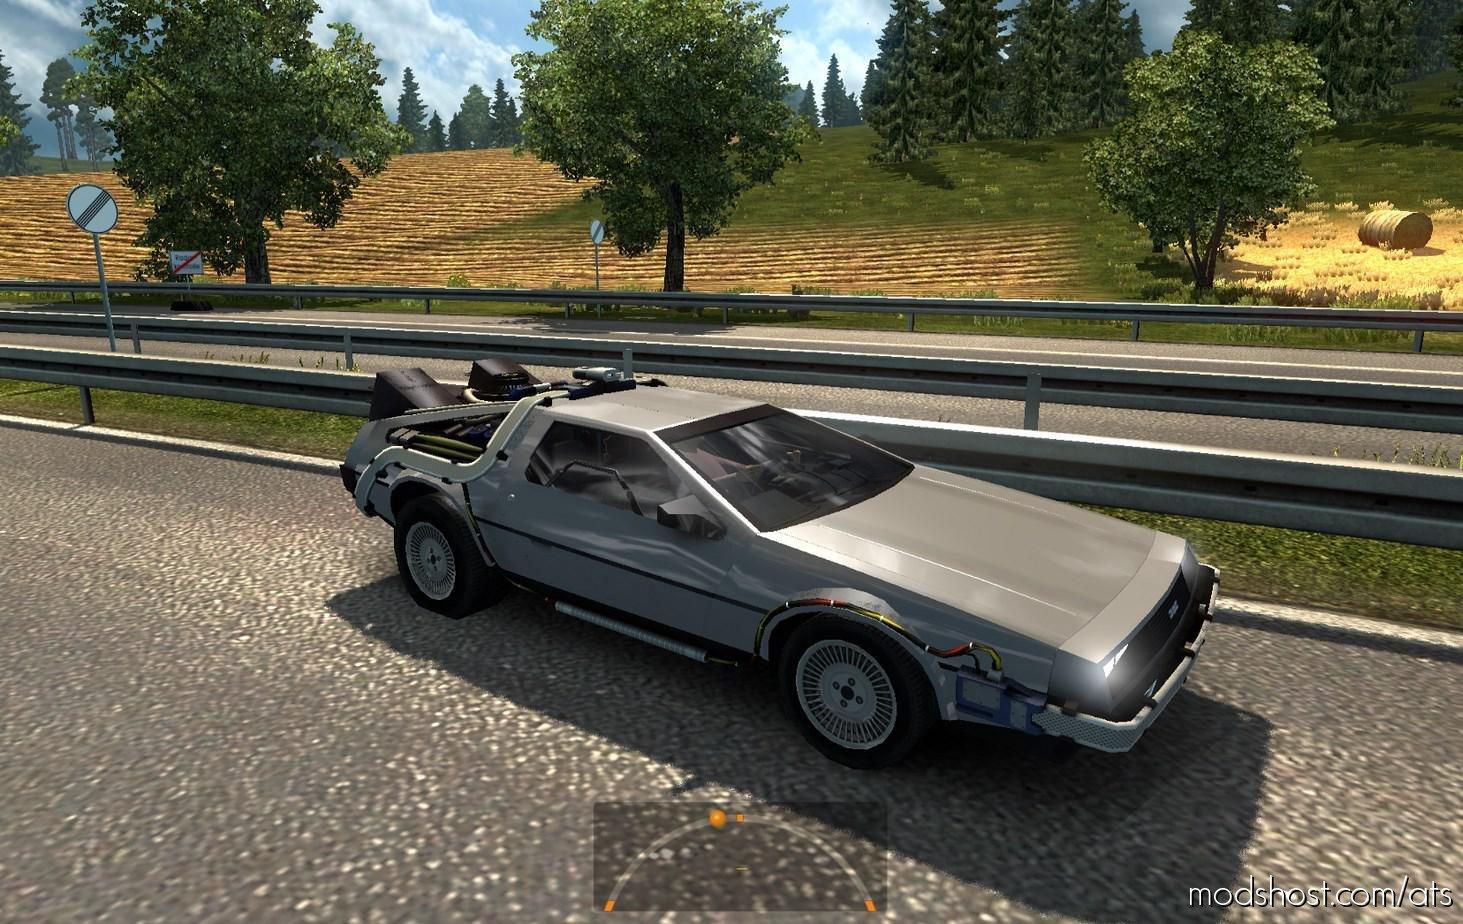 Sports CAR Delorean Dmc-12 IN Traffic V2.0 for American Truck Simulator